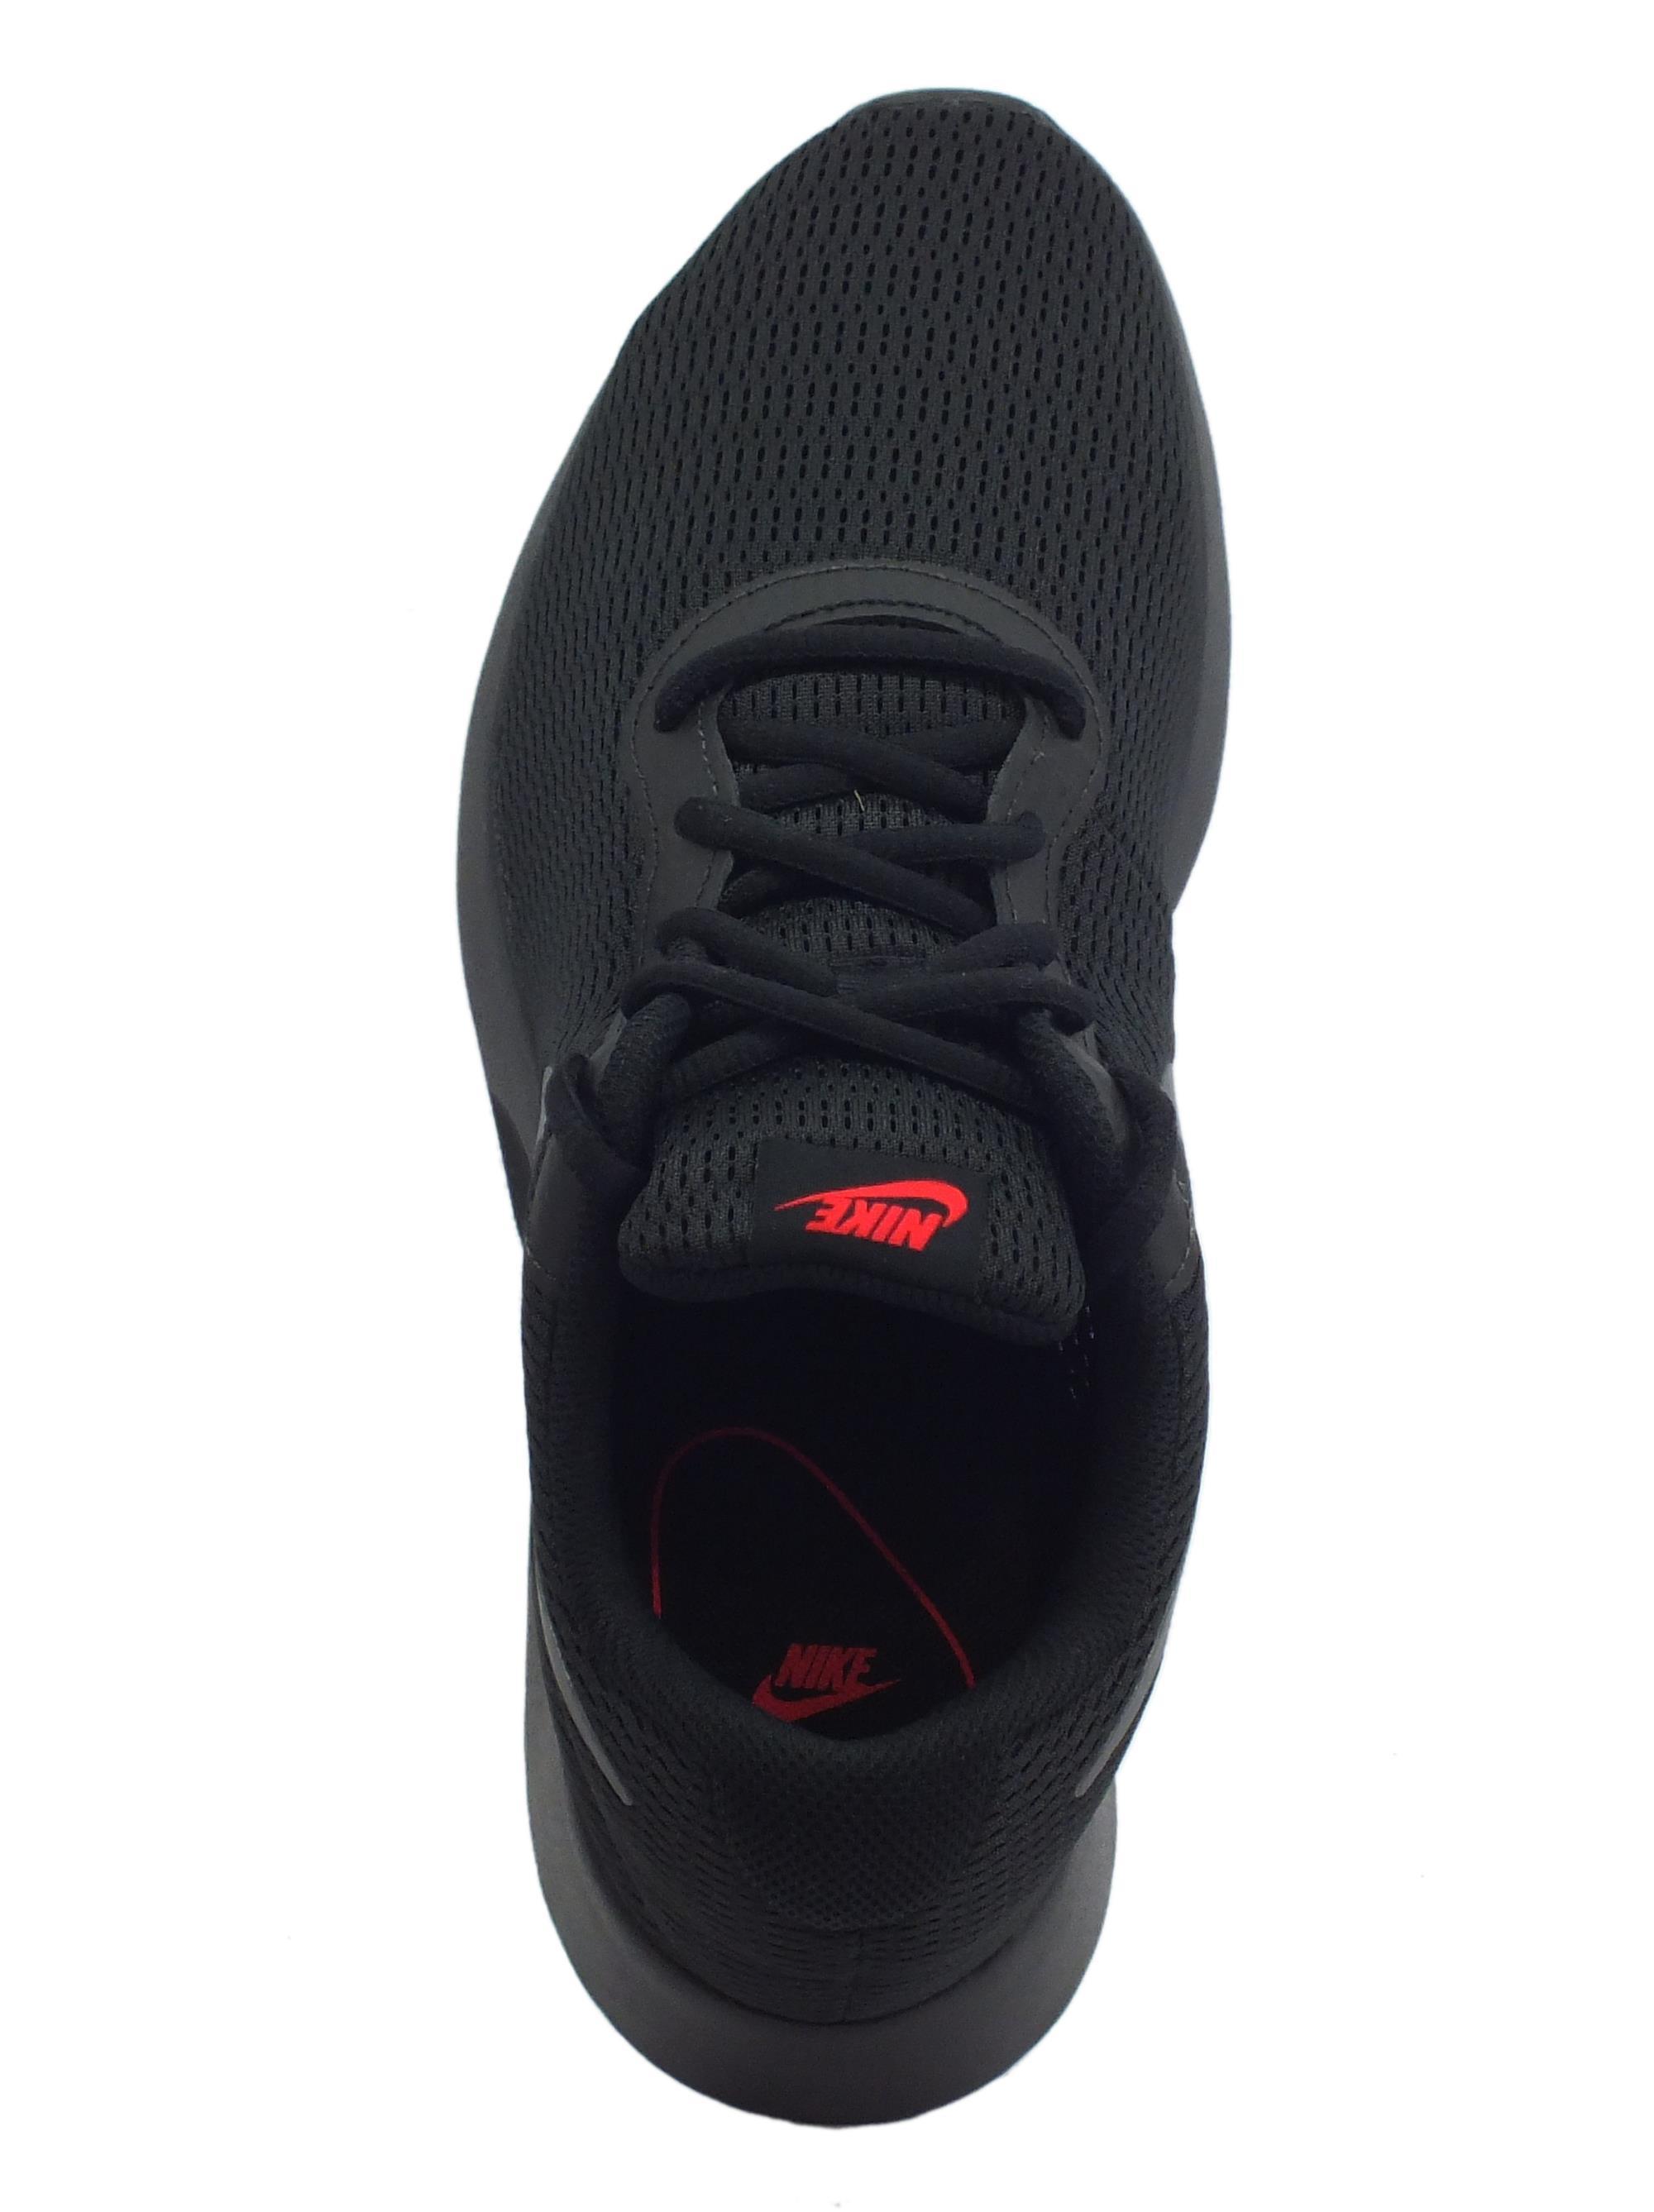 Scarpe sportive Nike Tanjun uomo tessuto nero - Vitiello Calzature 413b9503a31